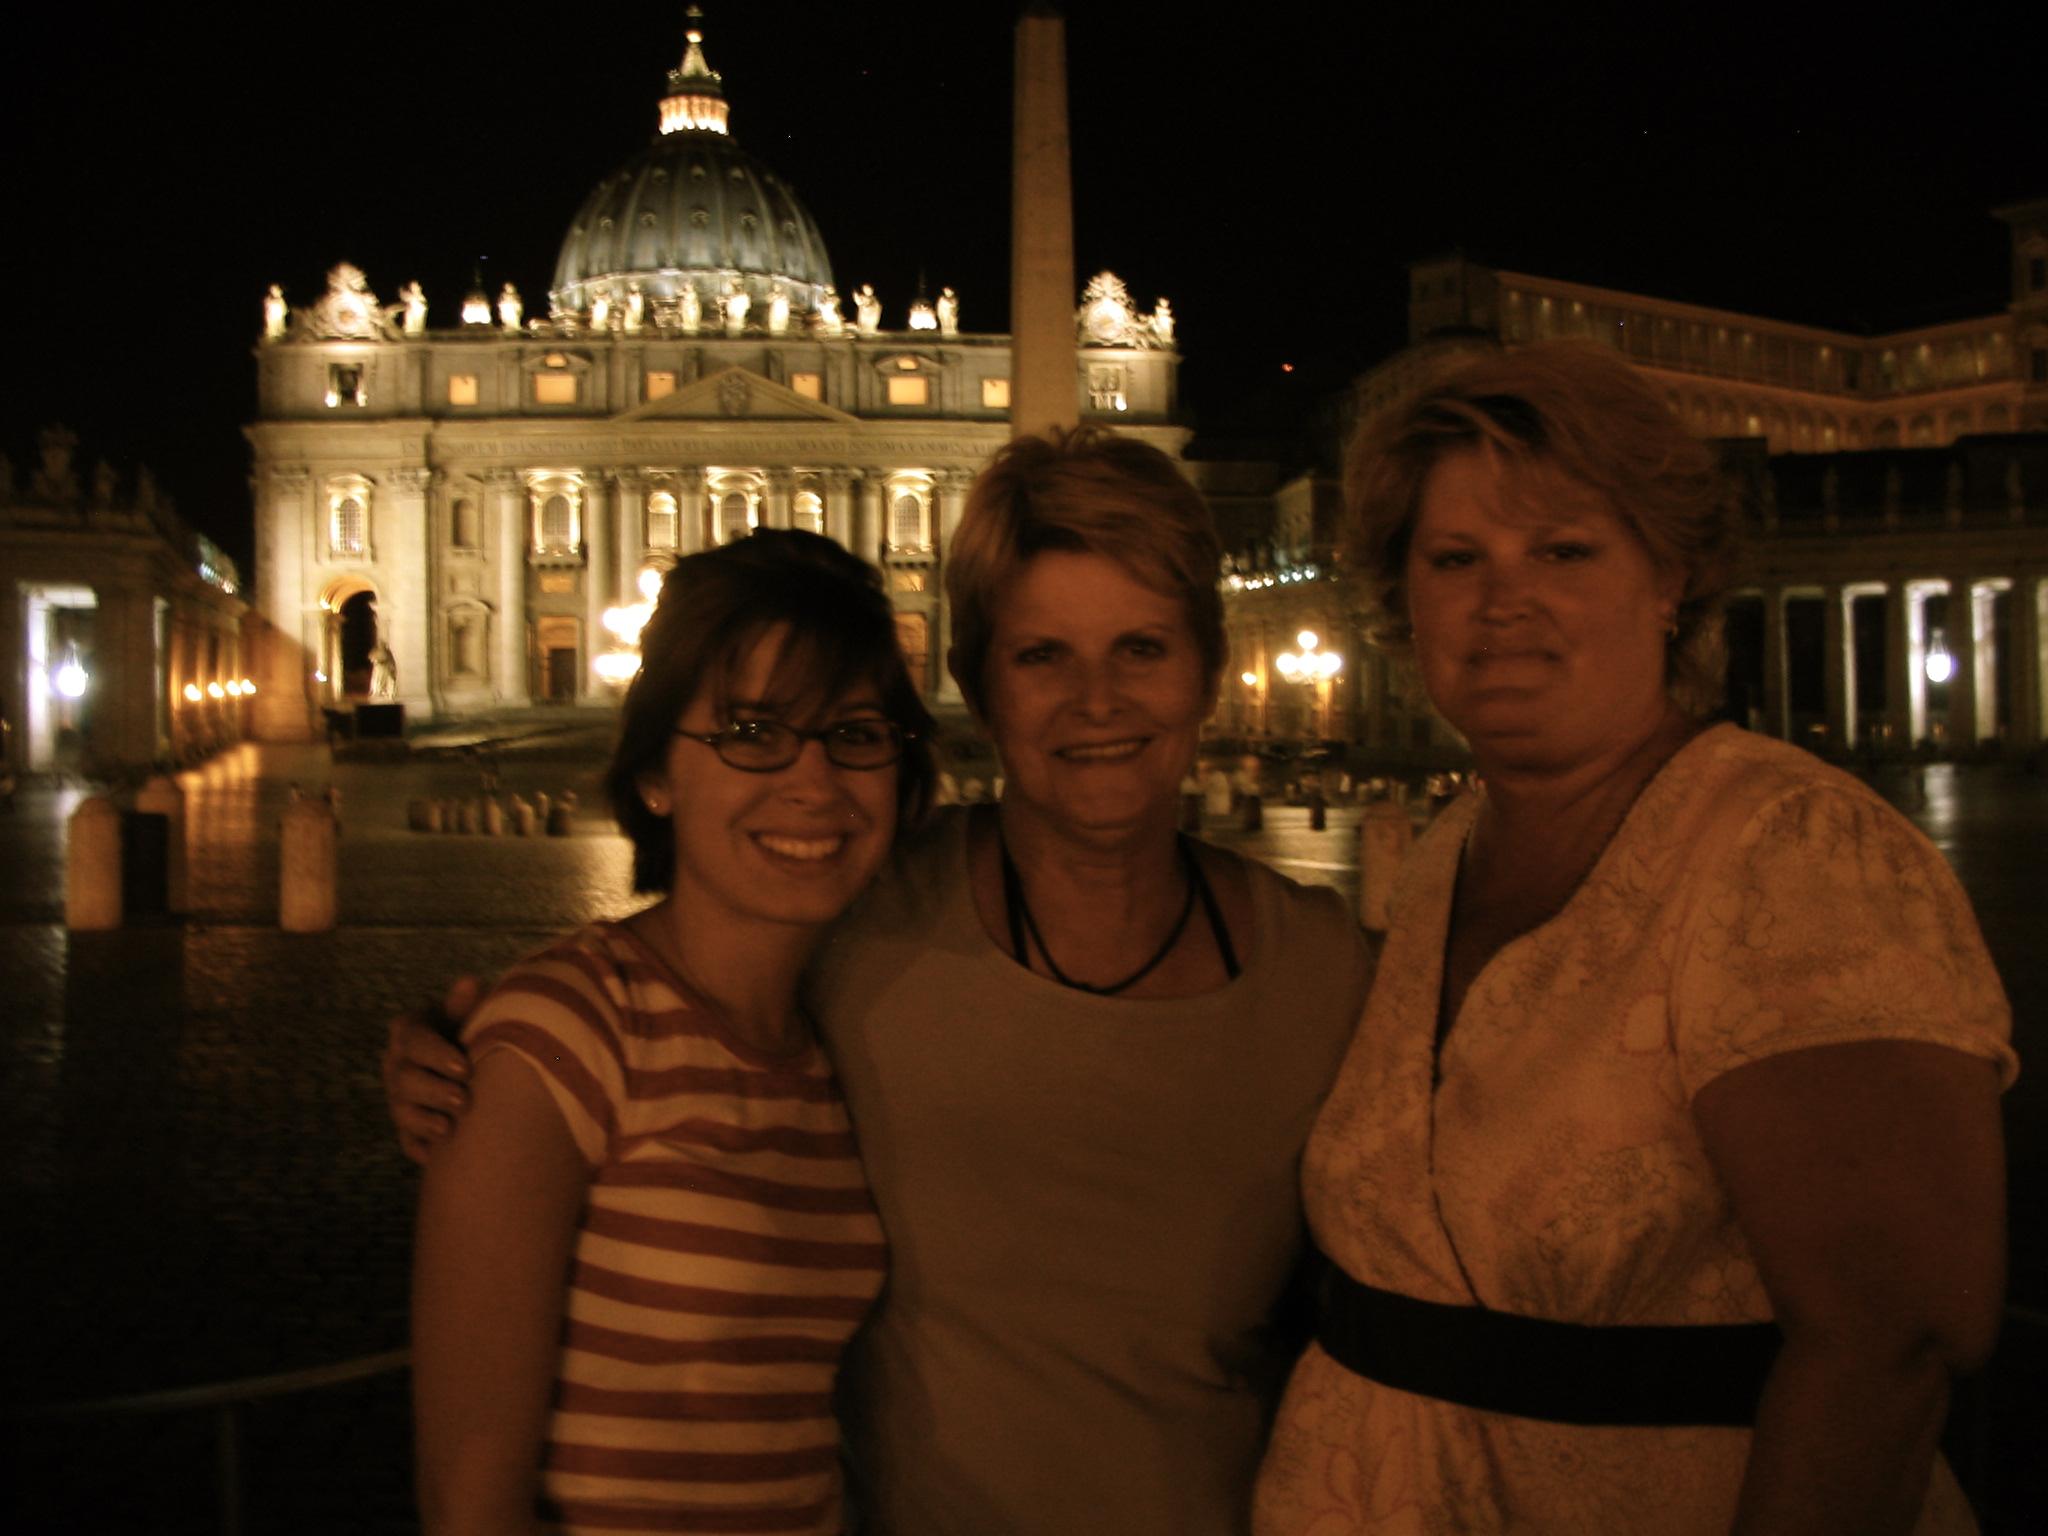 Saint Peter's Basilica at night: with my mom and grandma